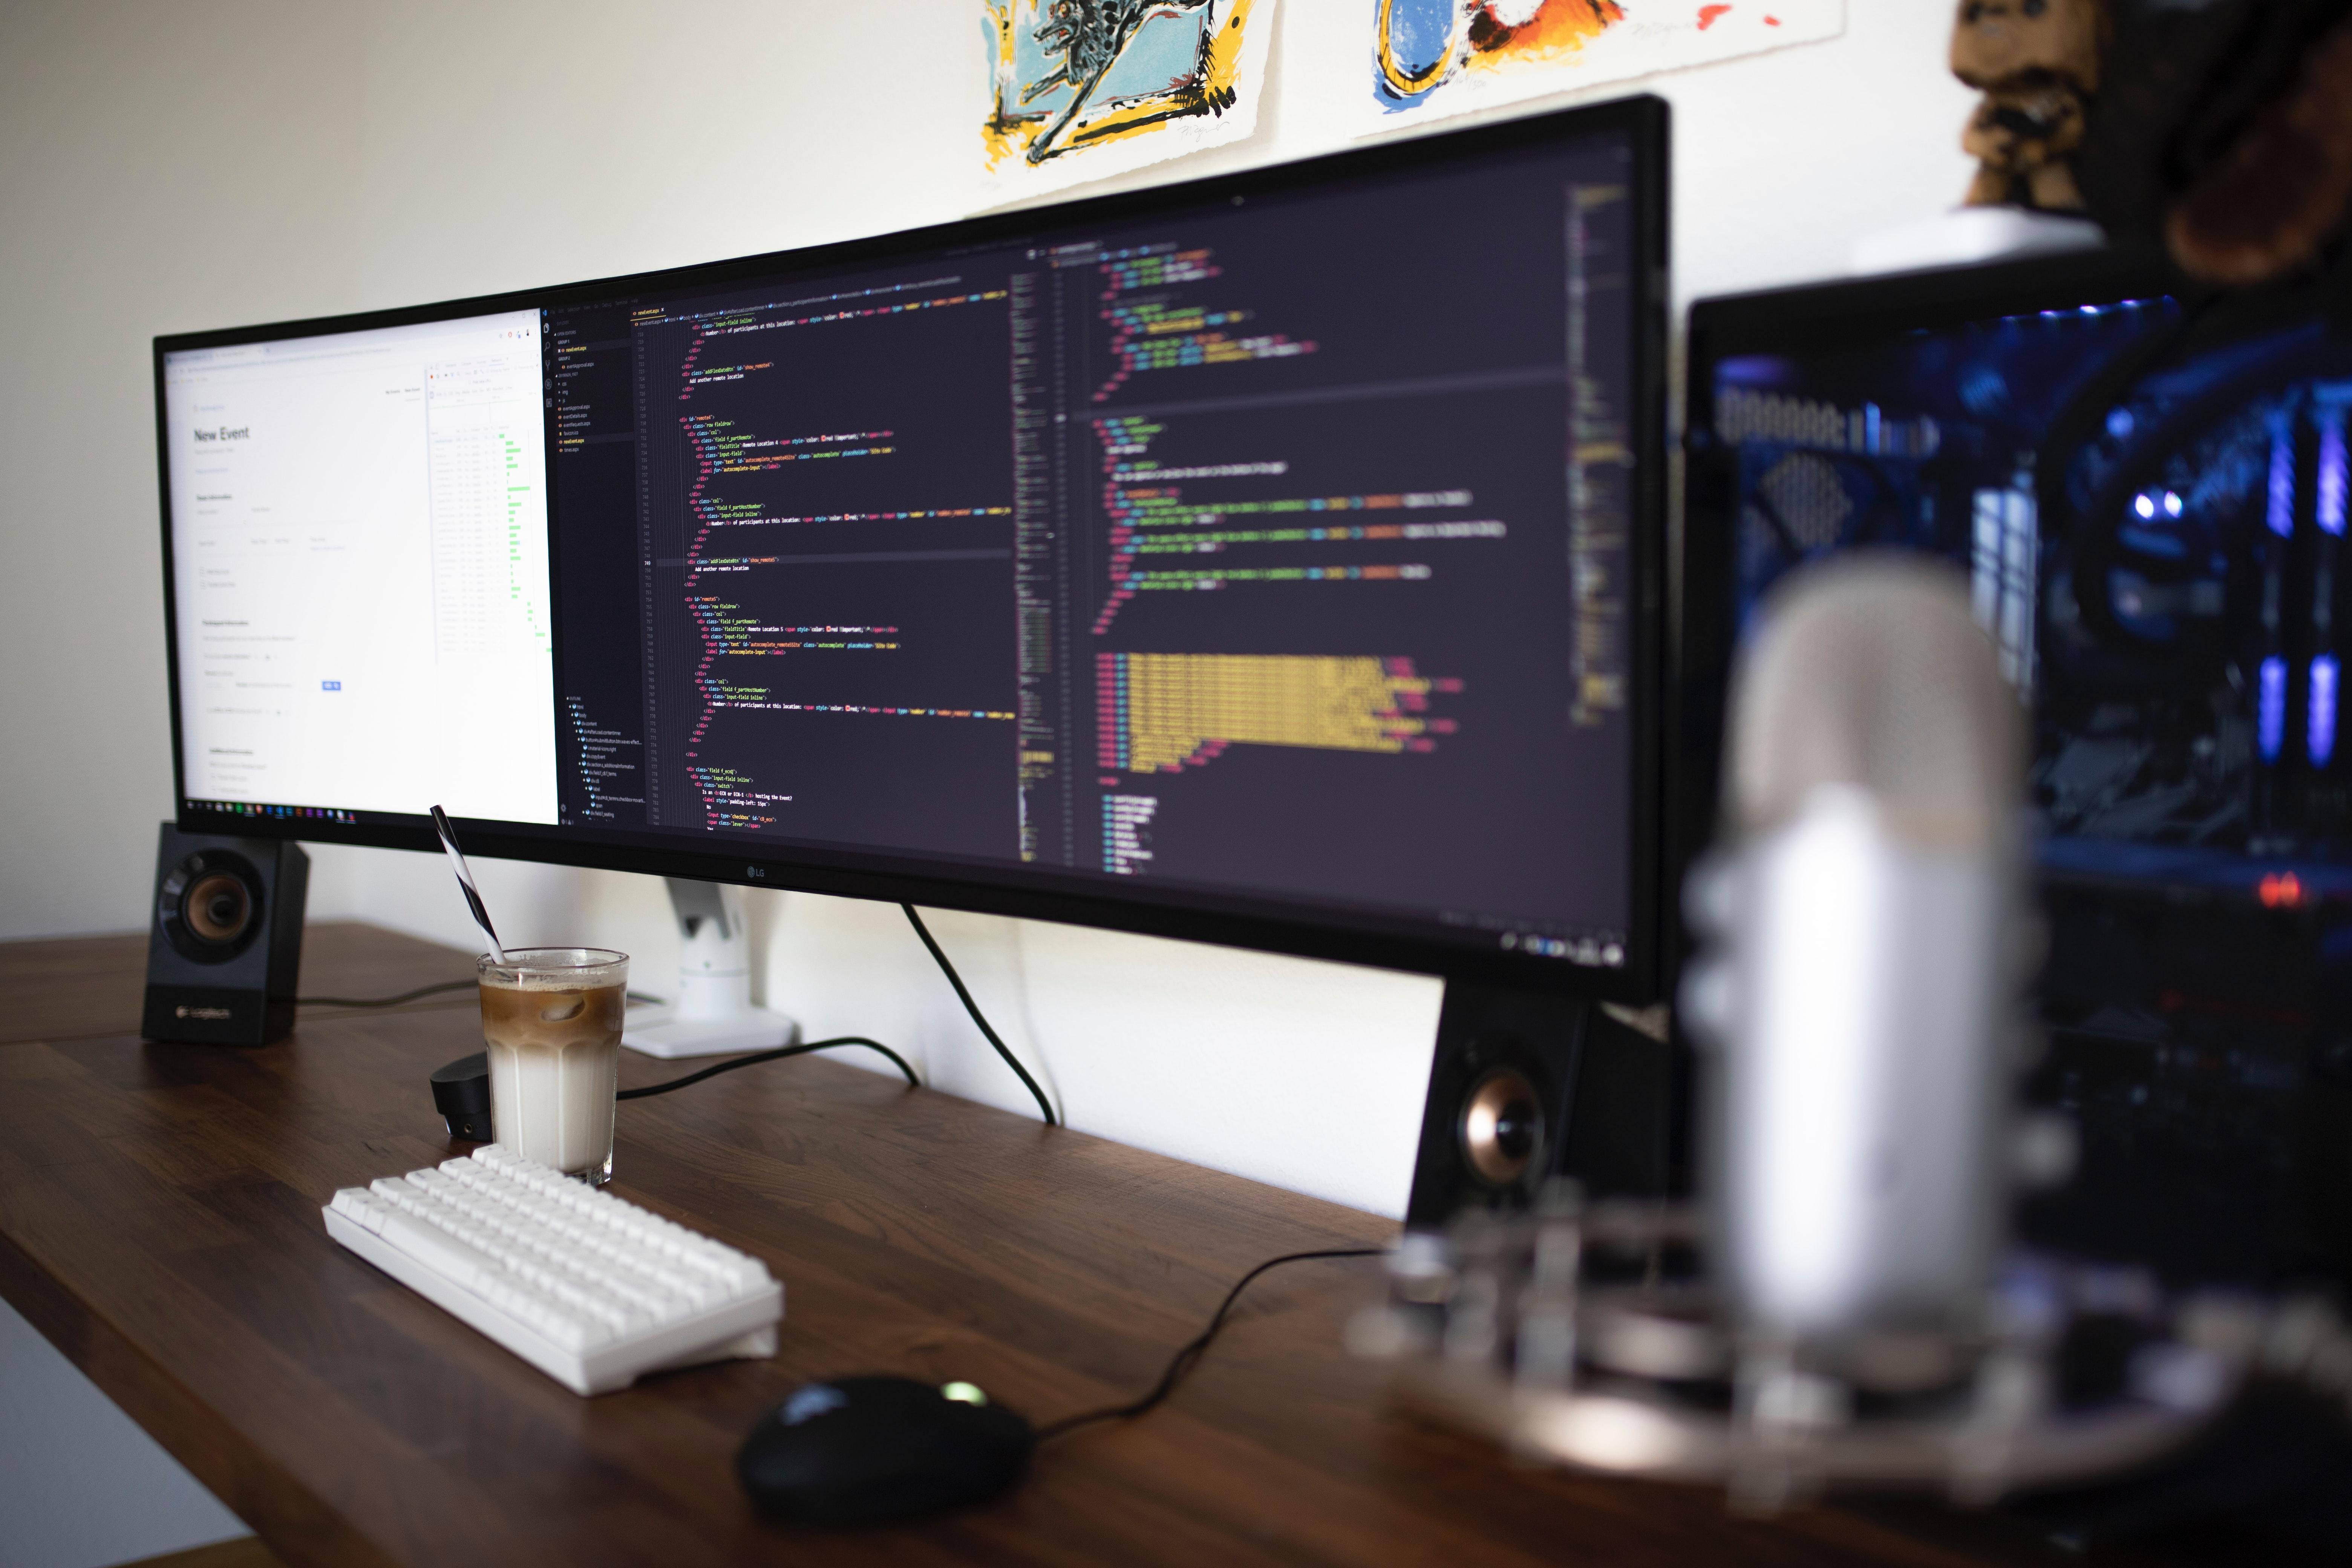 Angular Js developers